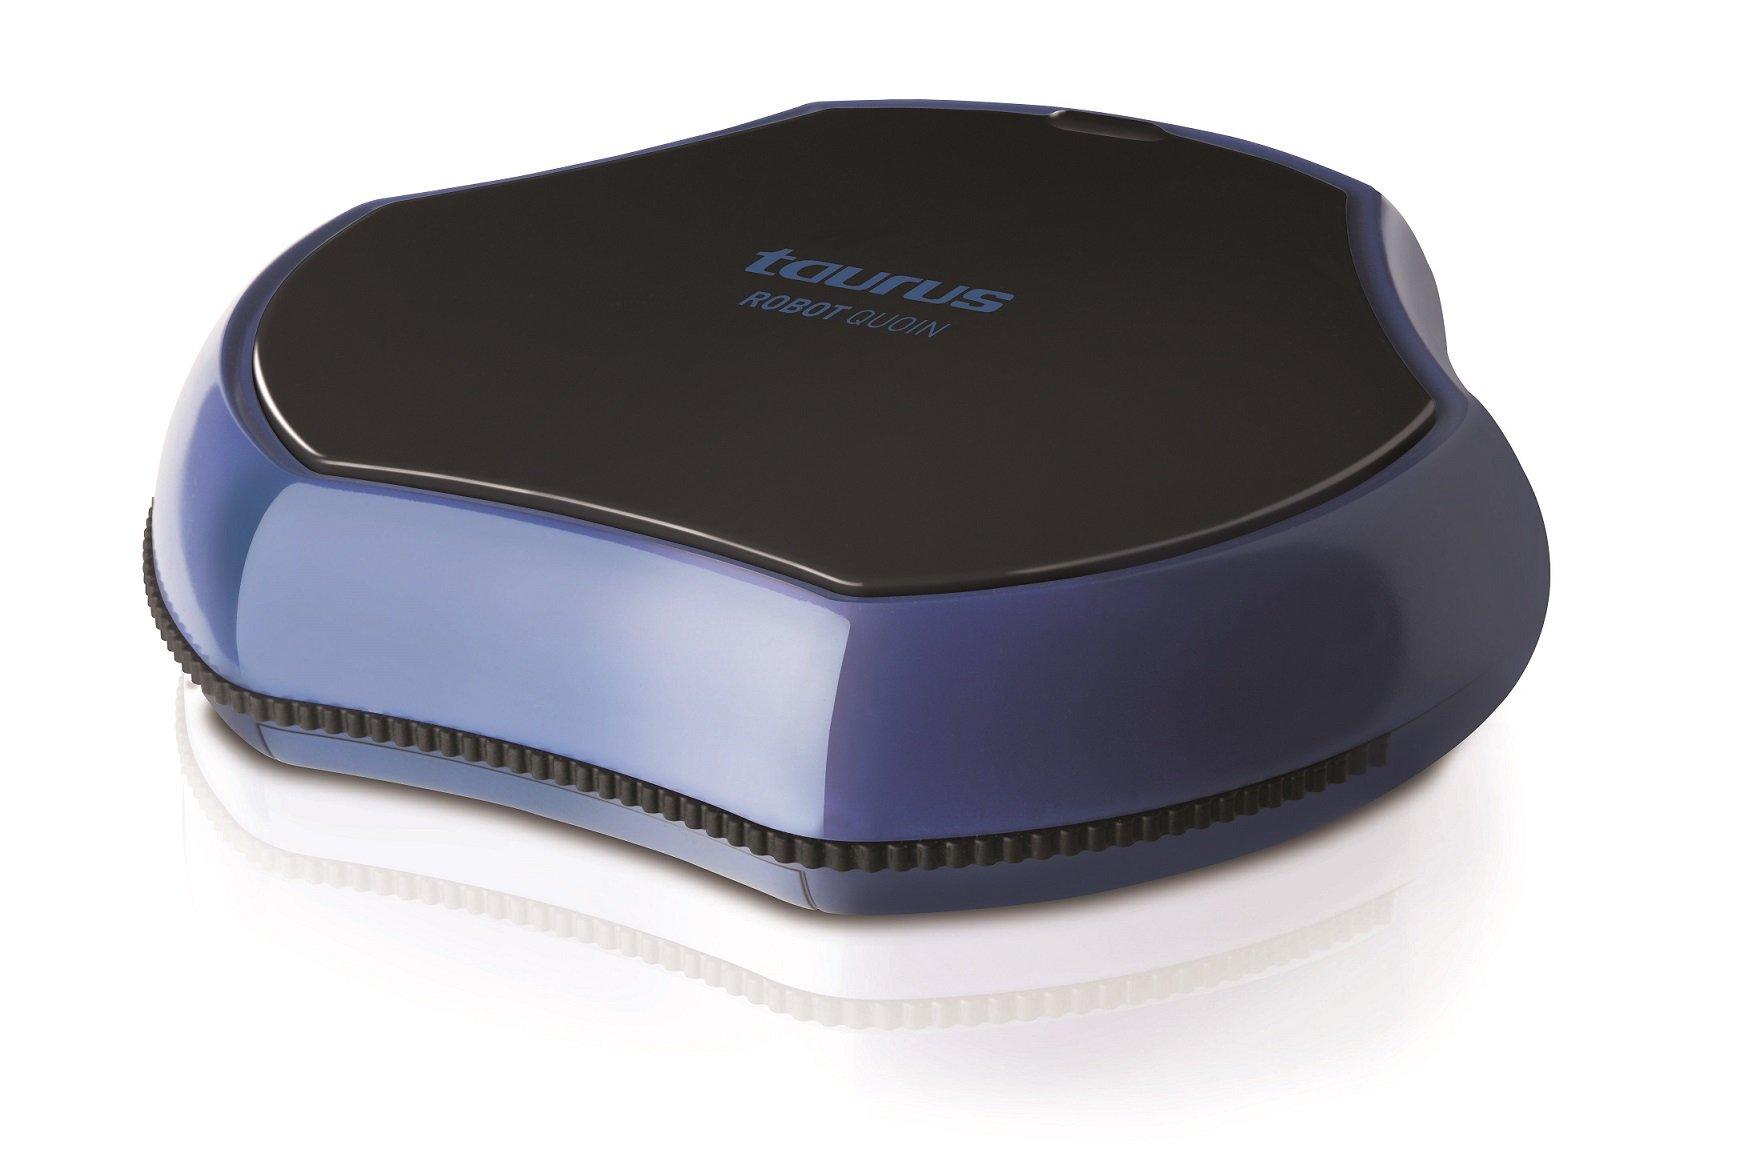 Amazon.es: Taurus: Aspiradores robot